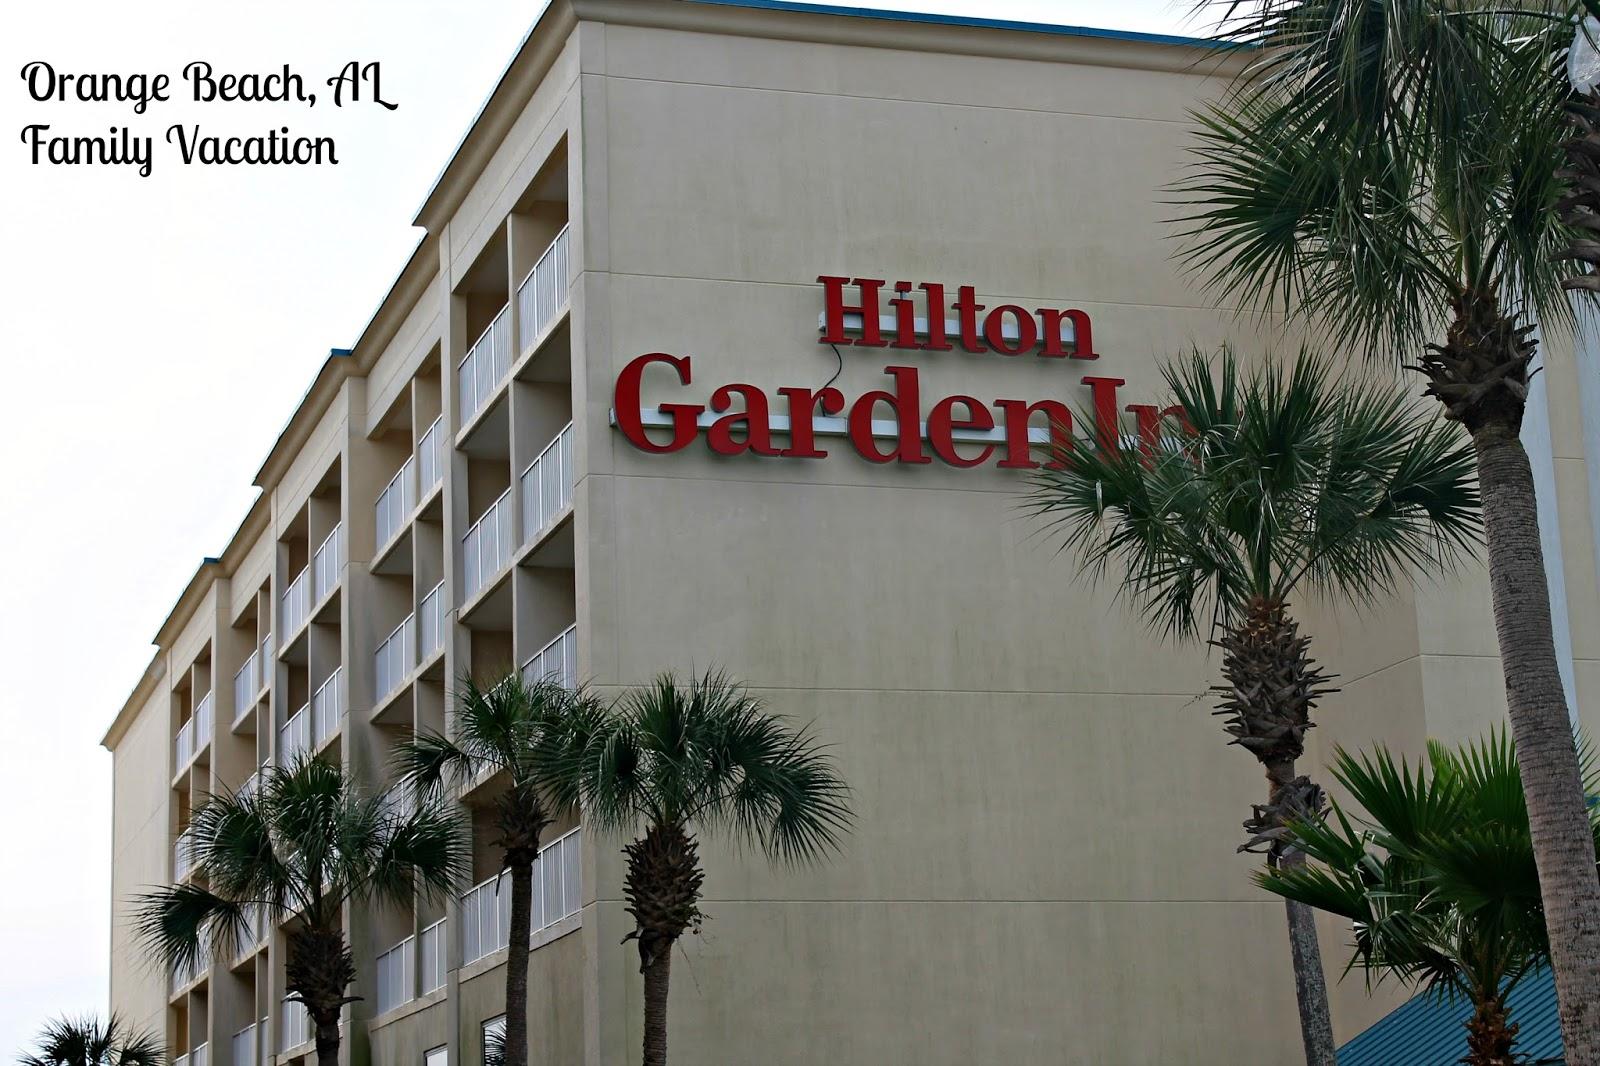 Hilton Garden Inn At Orange Beach, AL